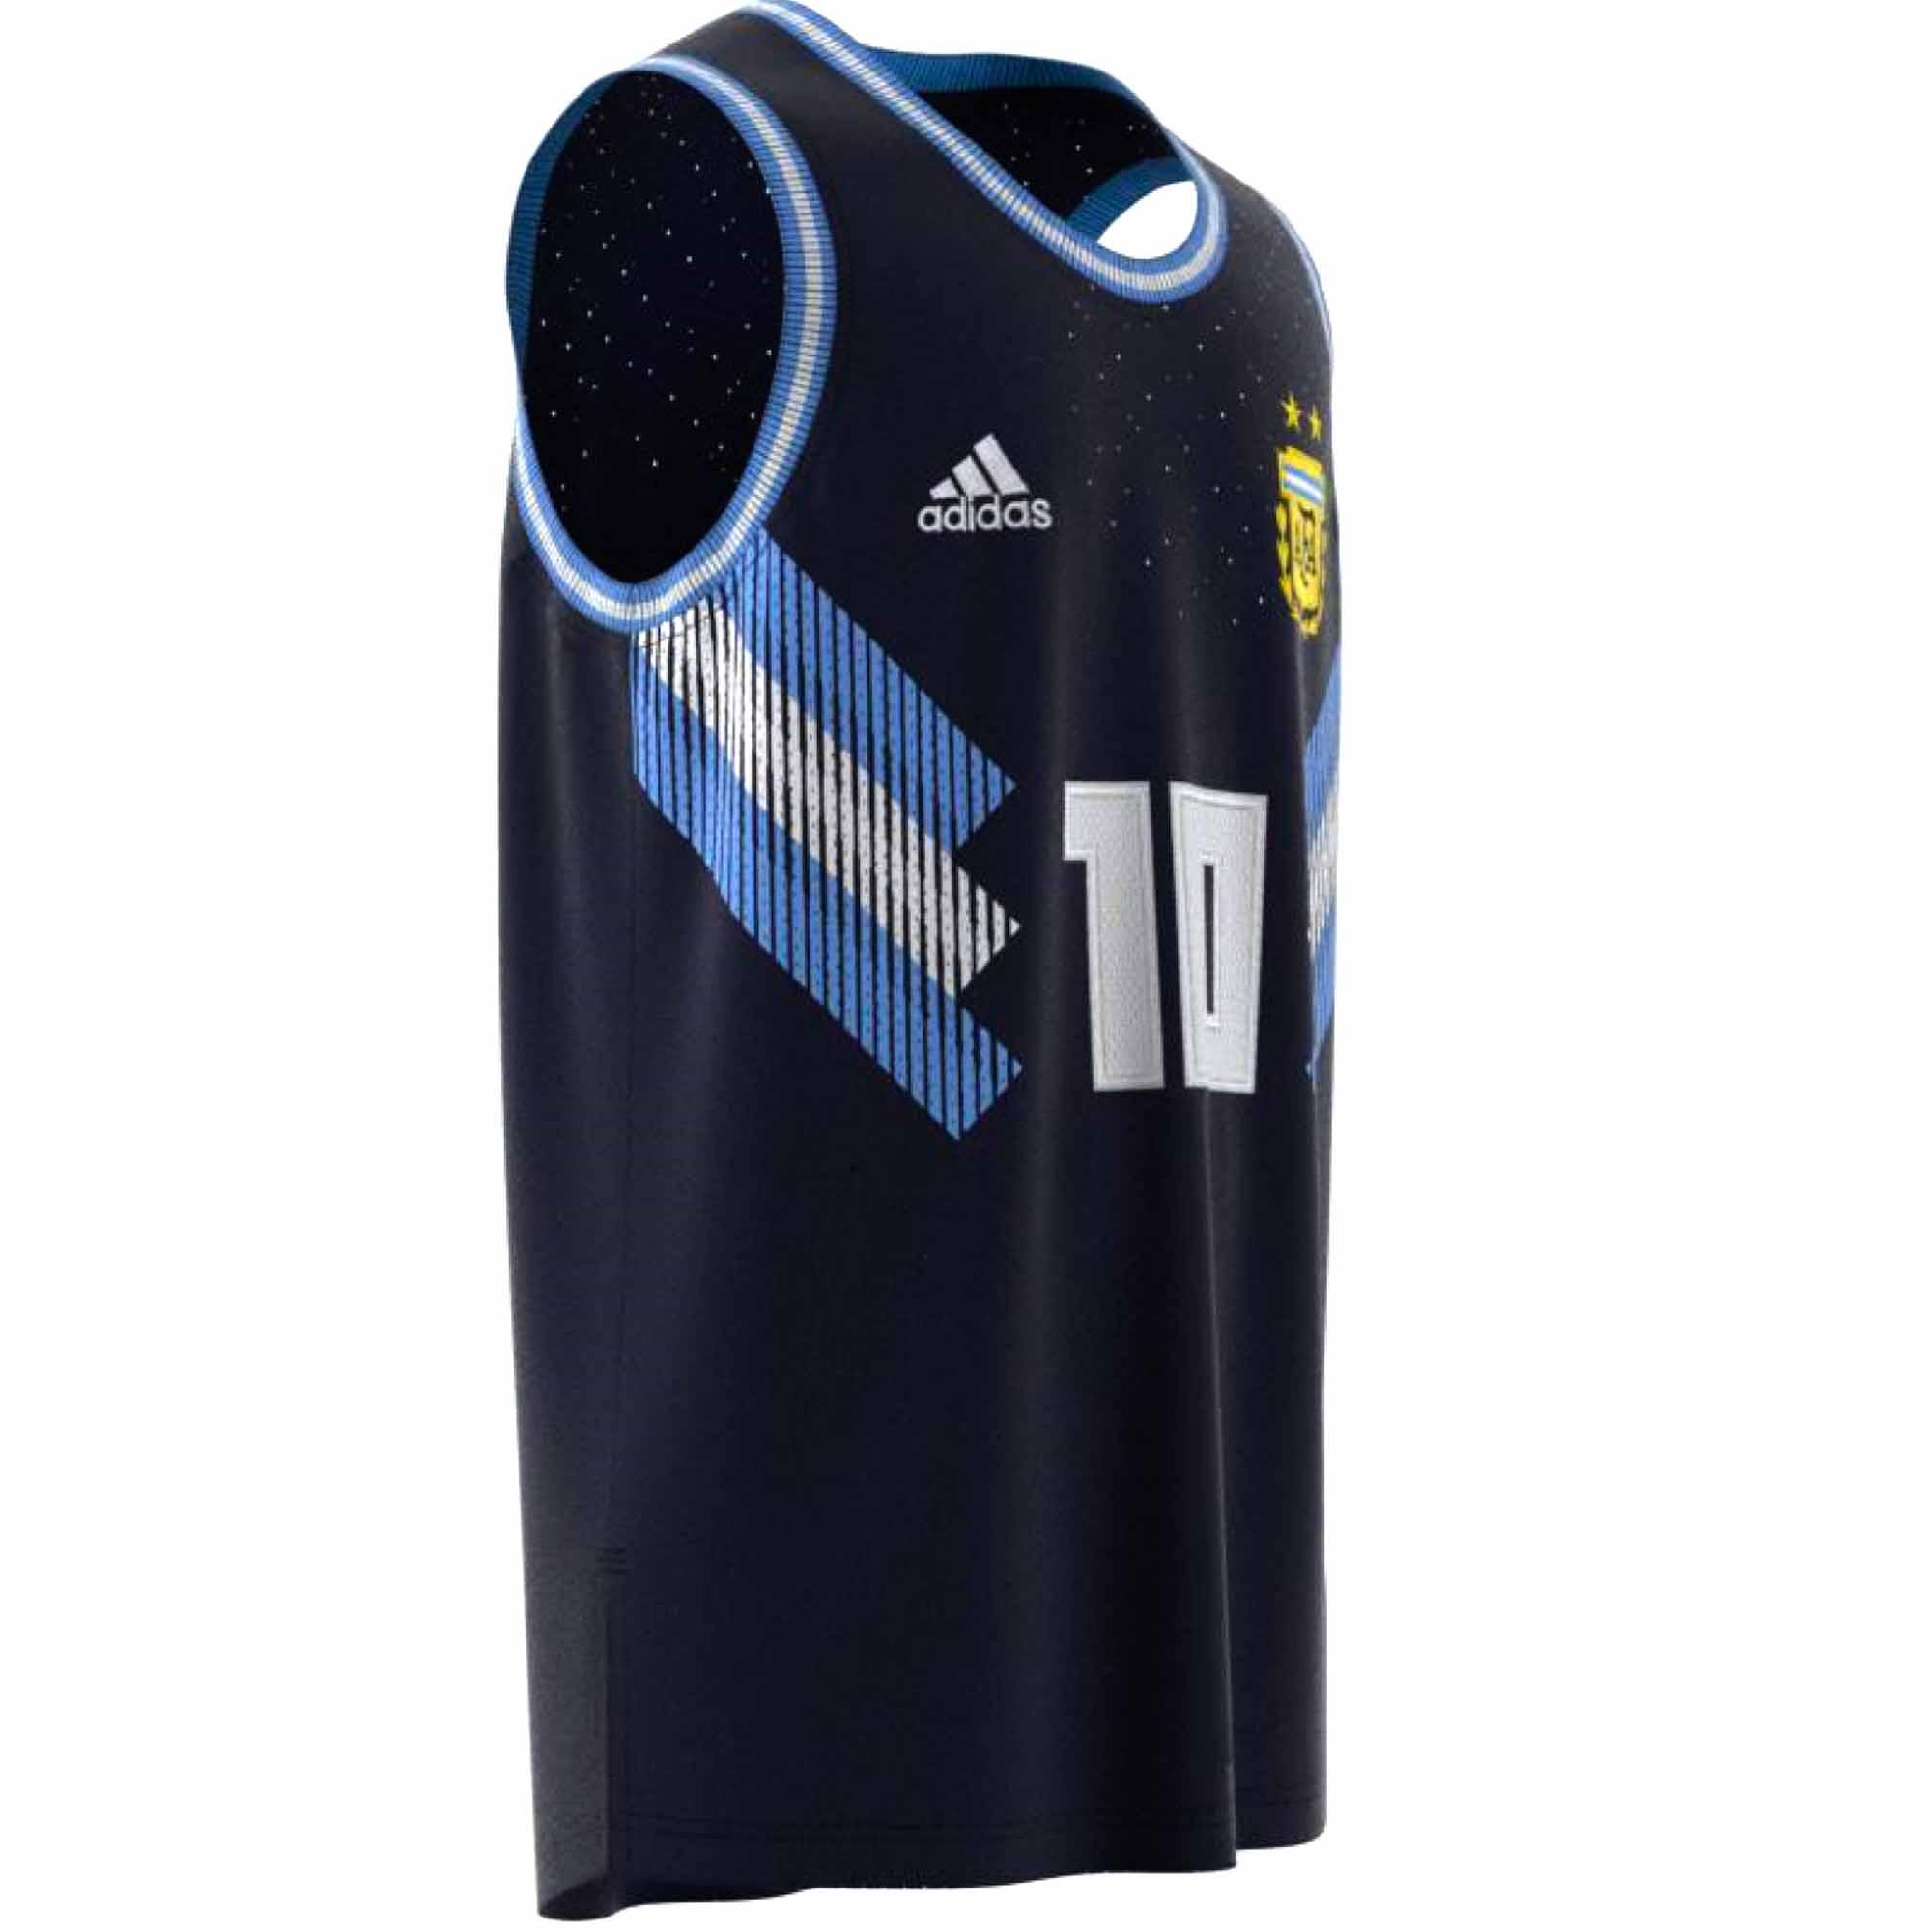 adidas Argentina Basketball Jersey 2018-19 - Soccer Master